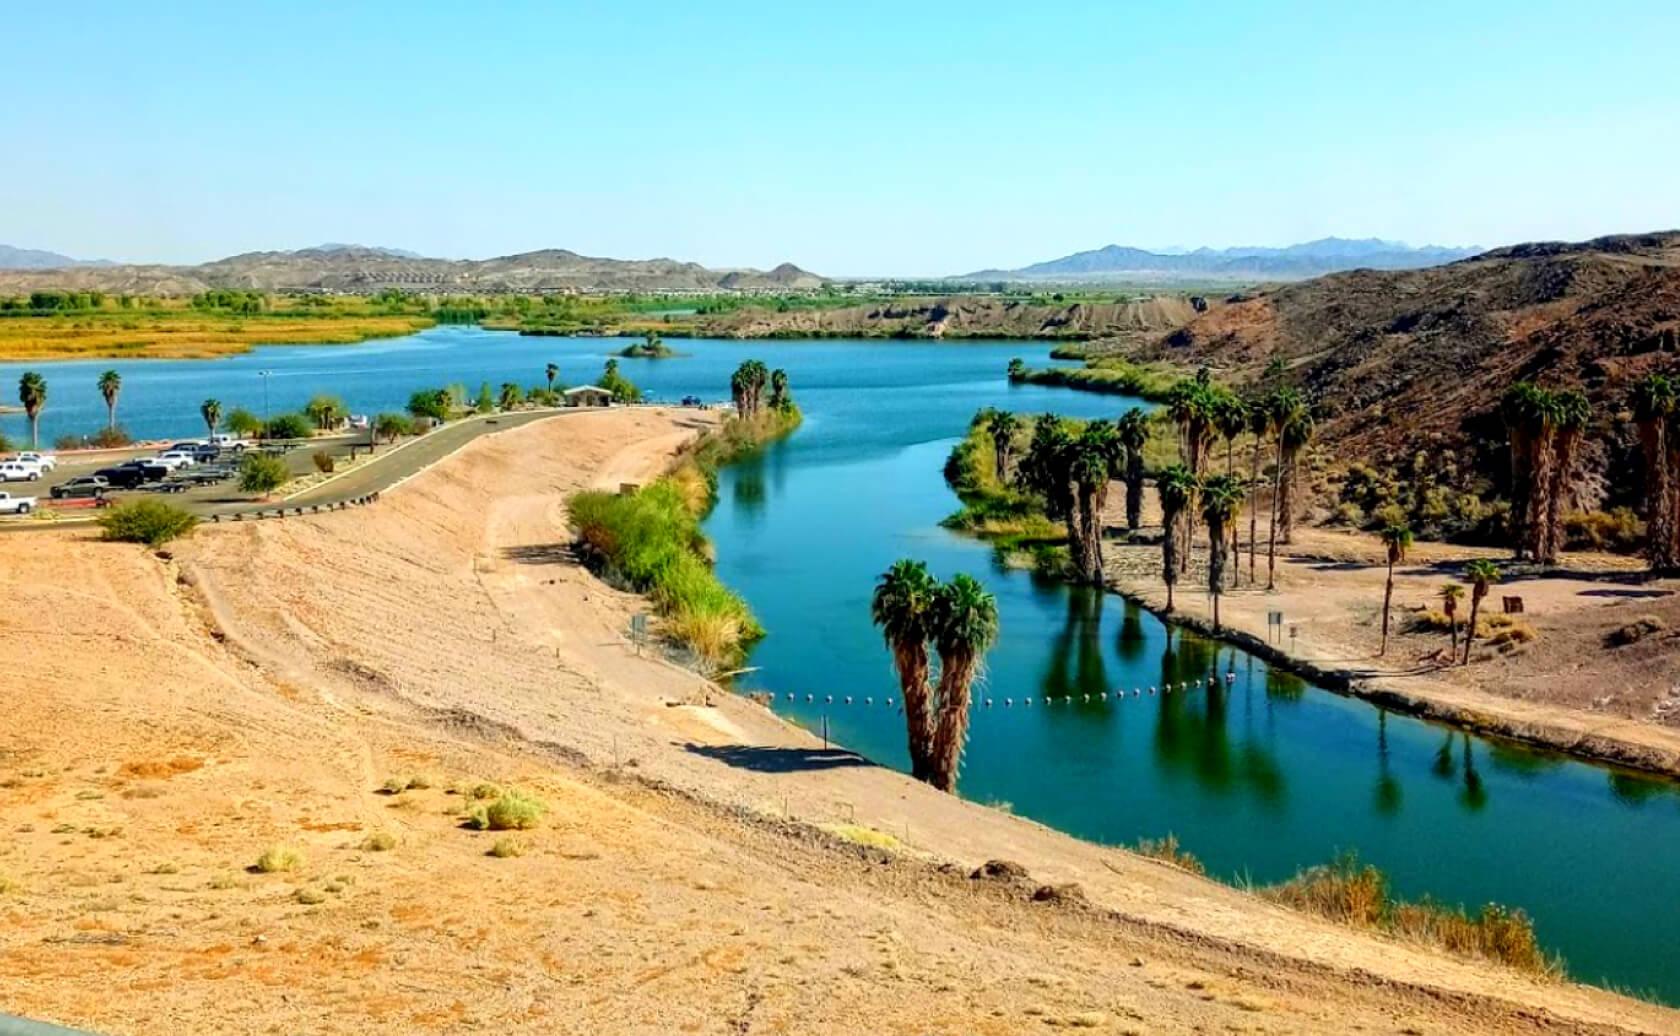 Martinez-Lake-fishing-guide-report-Arizona-03